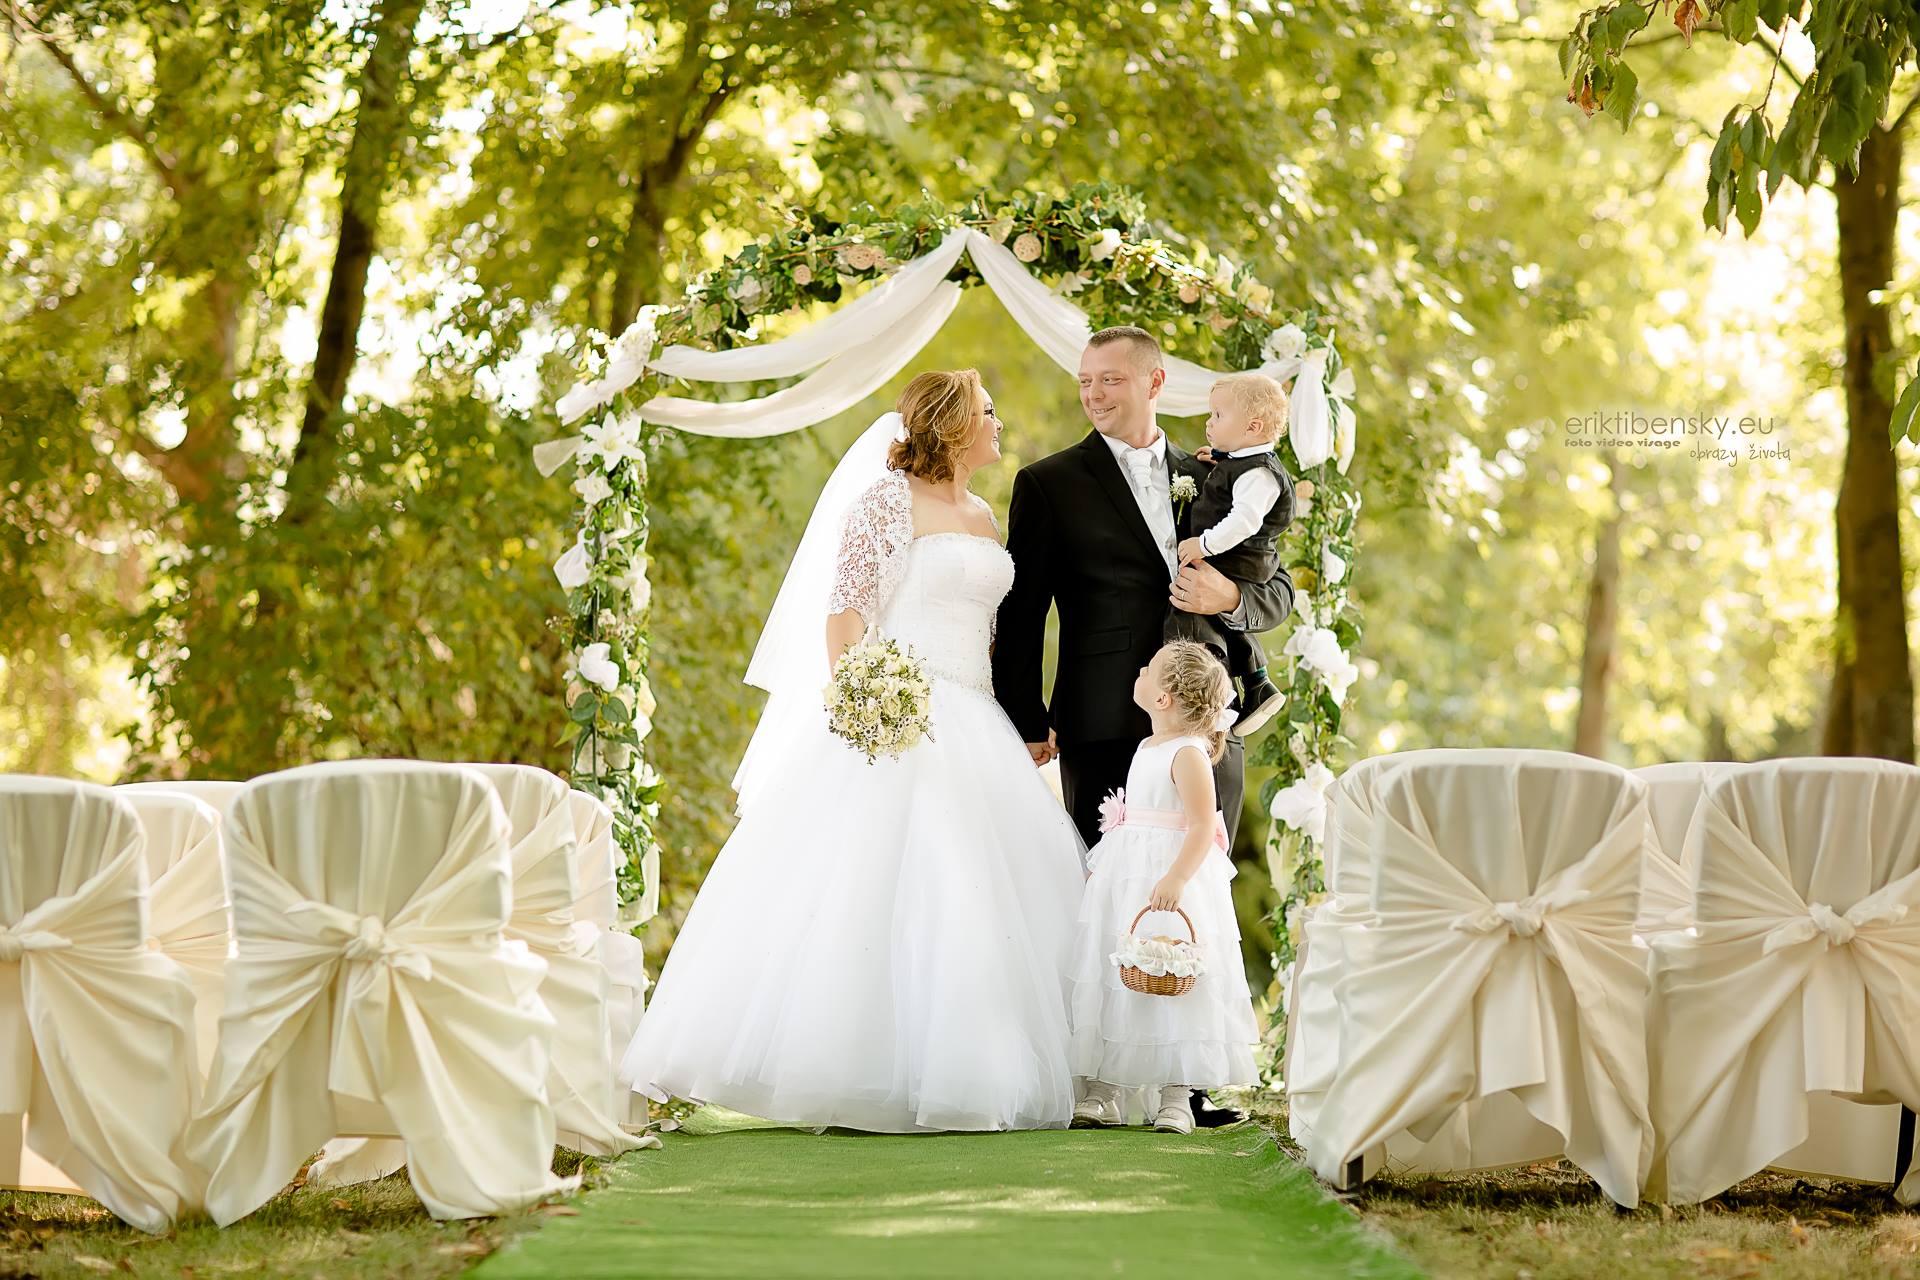 eriktibensky-eu-svadobny-fotograf-wedding-photographer-3027